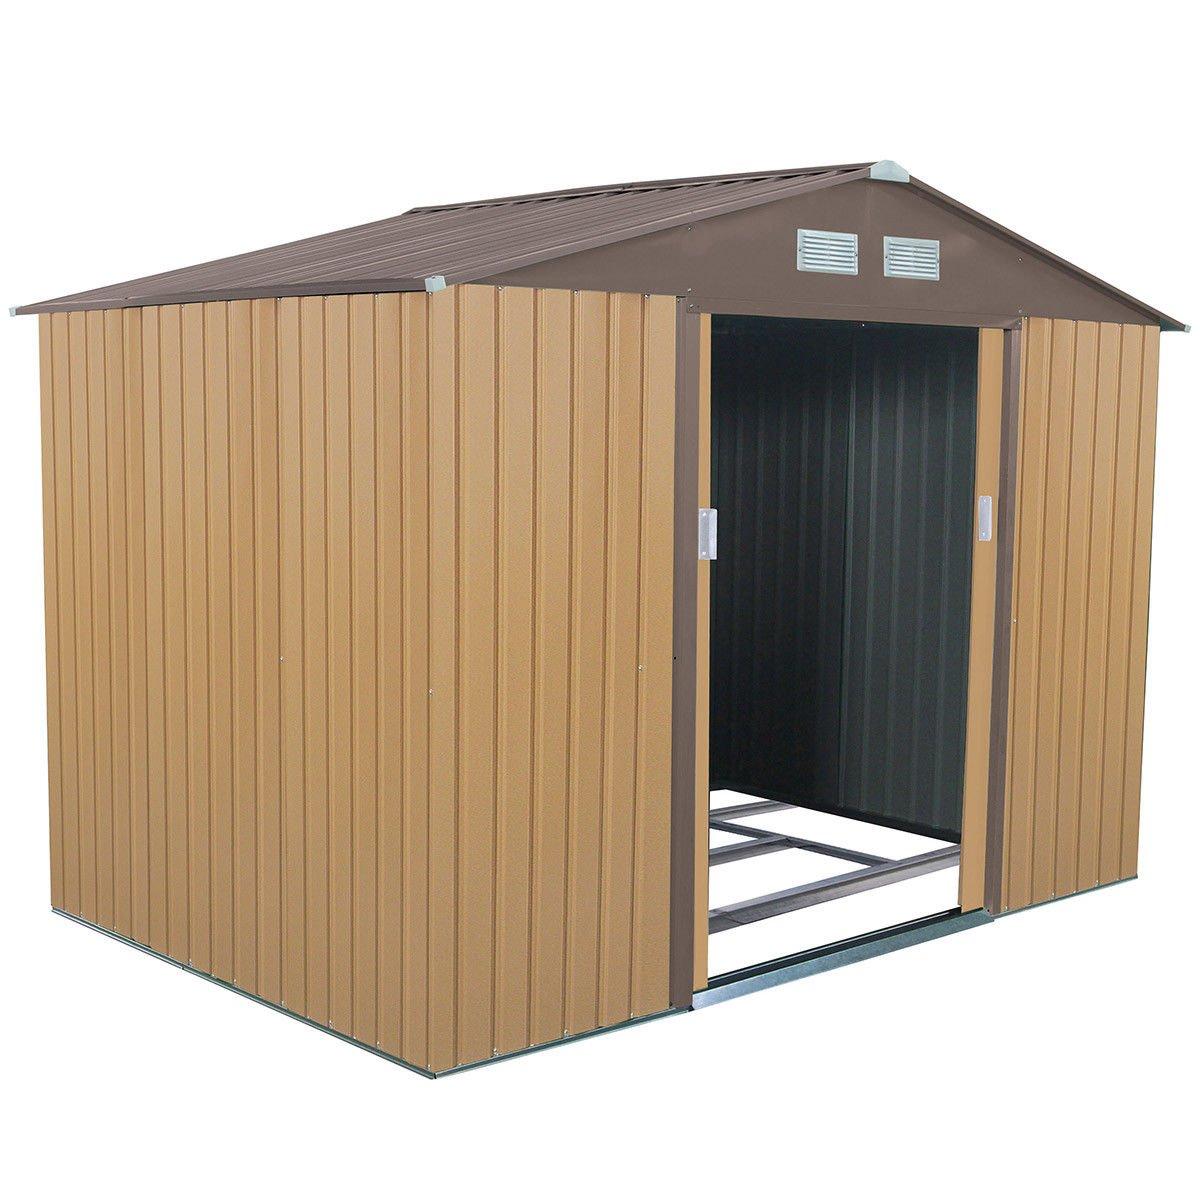 Goplus Outdoor Storage Shed Sliding Door Garden Tool House 9' X 6' (Khaki)